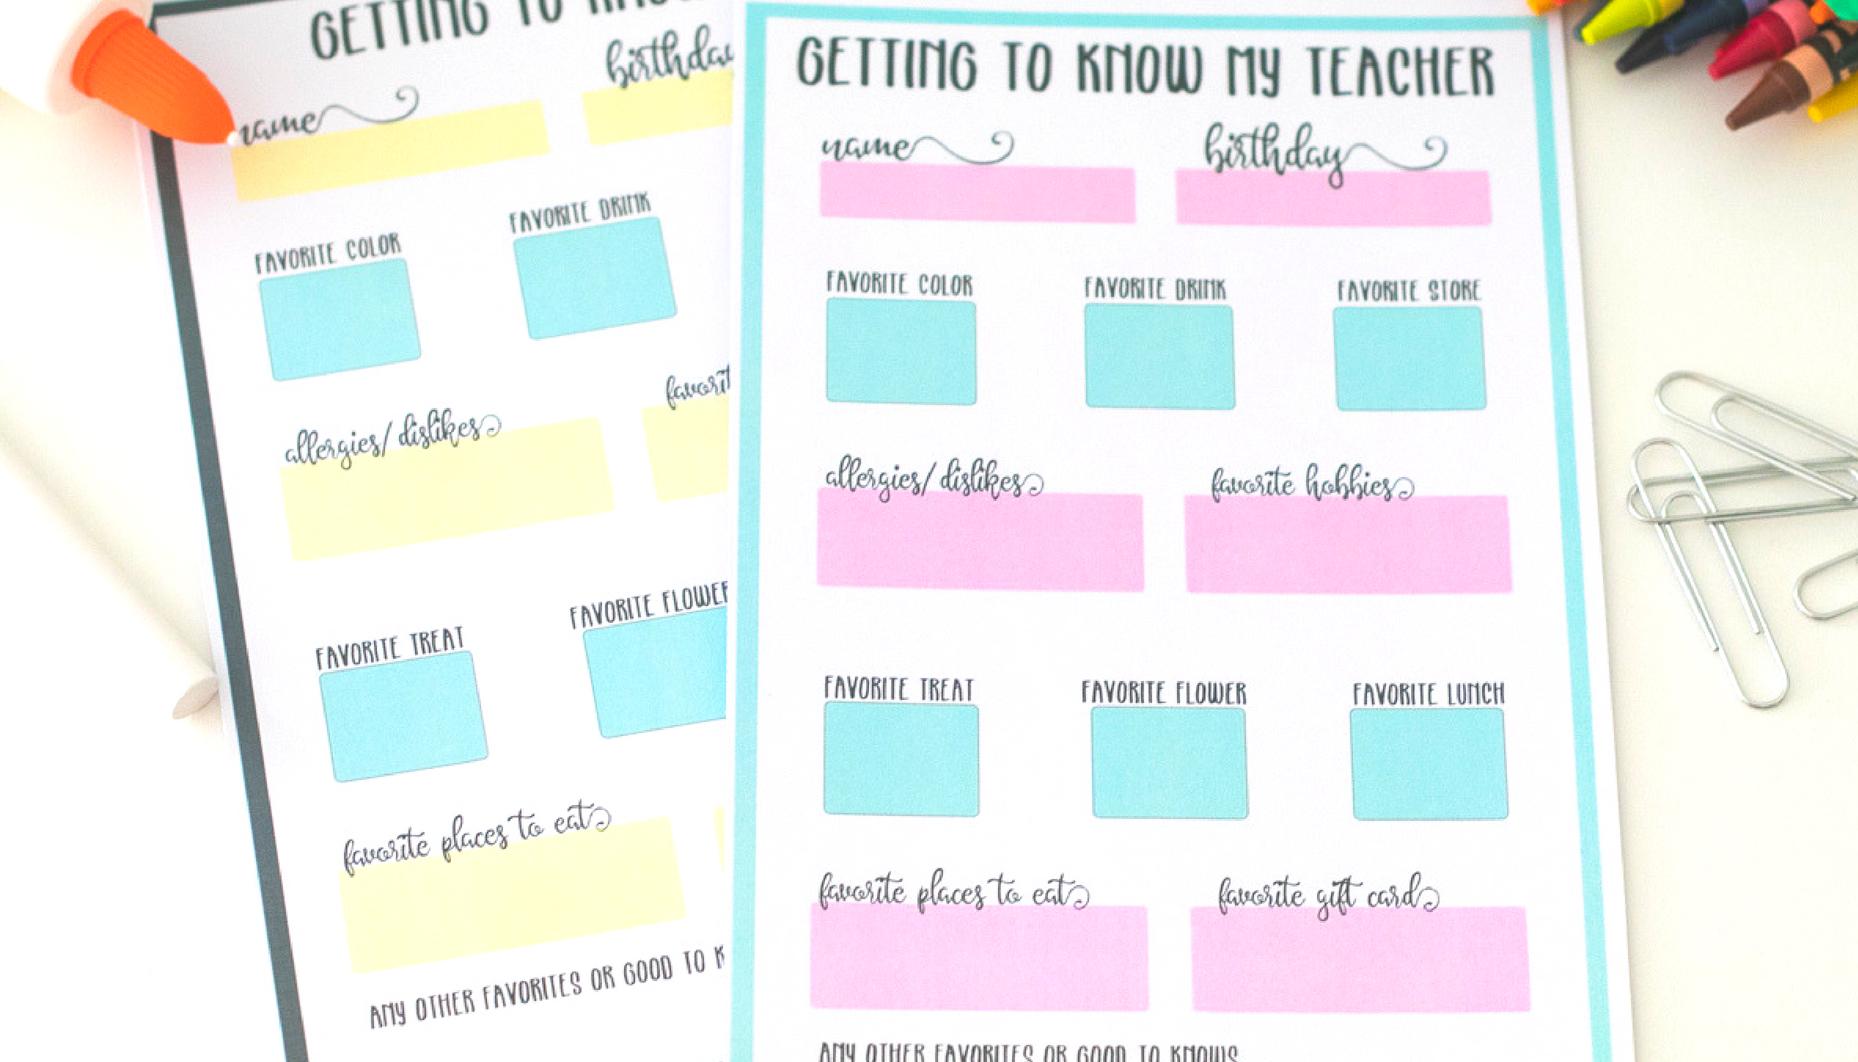 Get To Know My Teacher Free Printable Questionnaire - All About My Teacher Free Printable